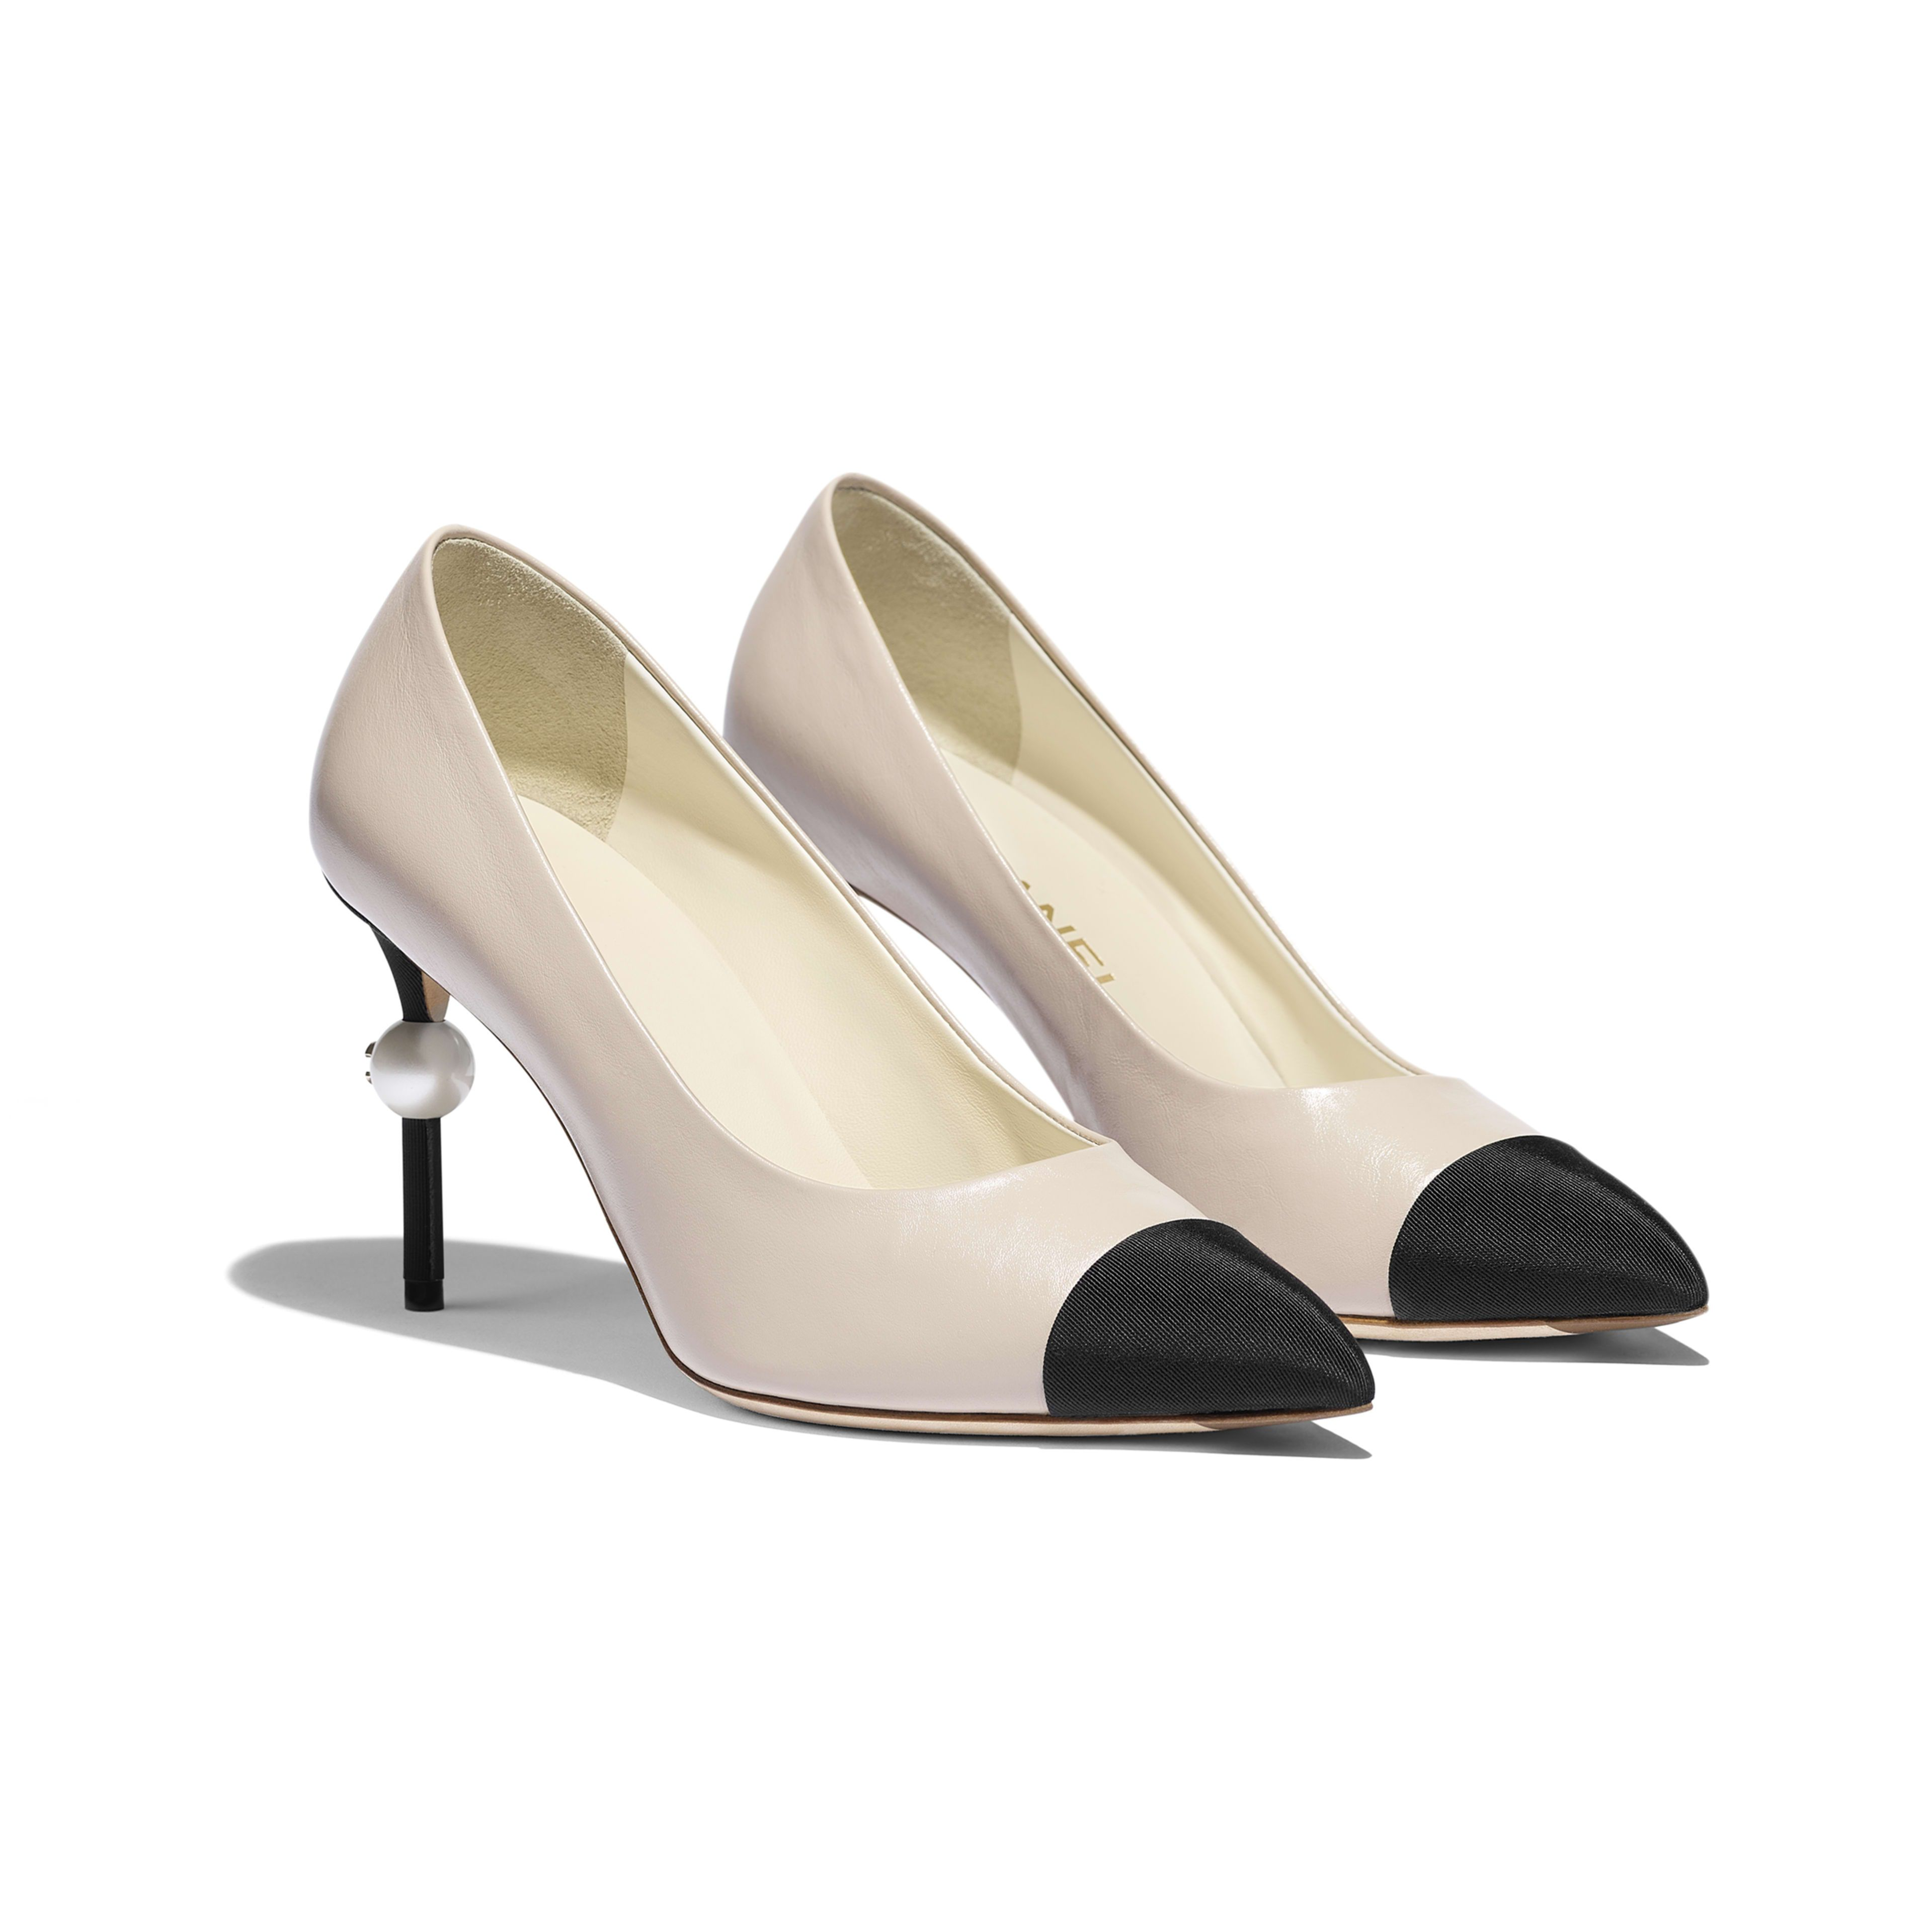 Fashion shoes, Chanel shoes